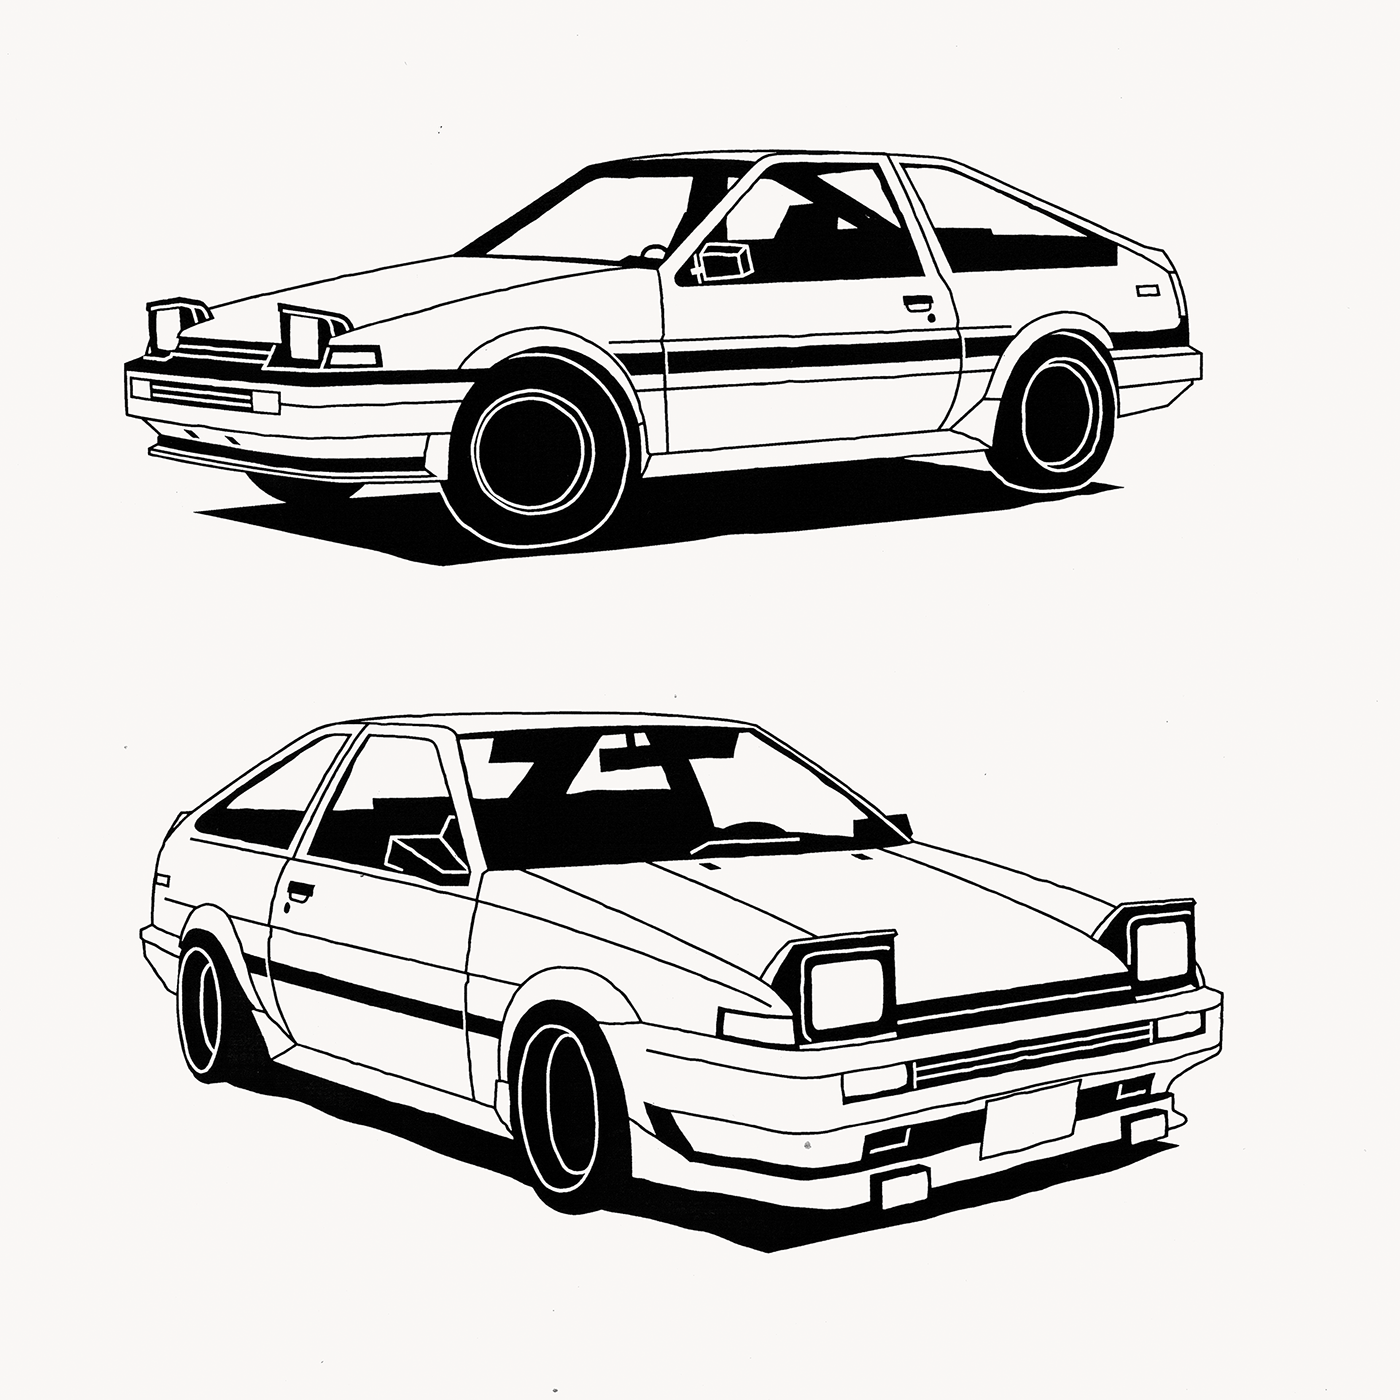 Behance Dibujos De Coches D Inicial Carros Y Motos